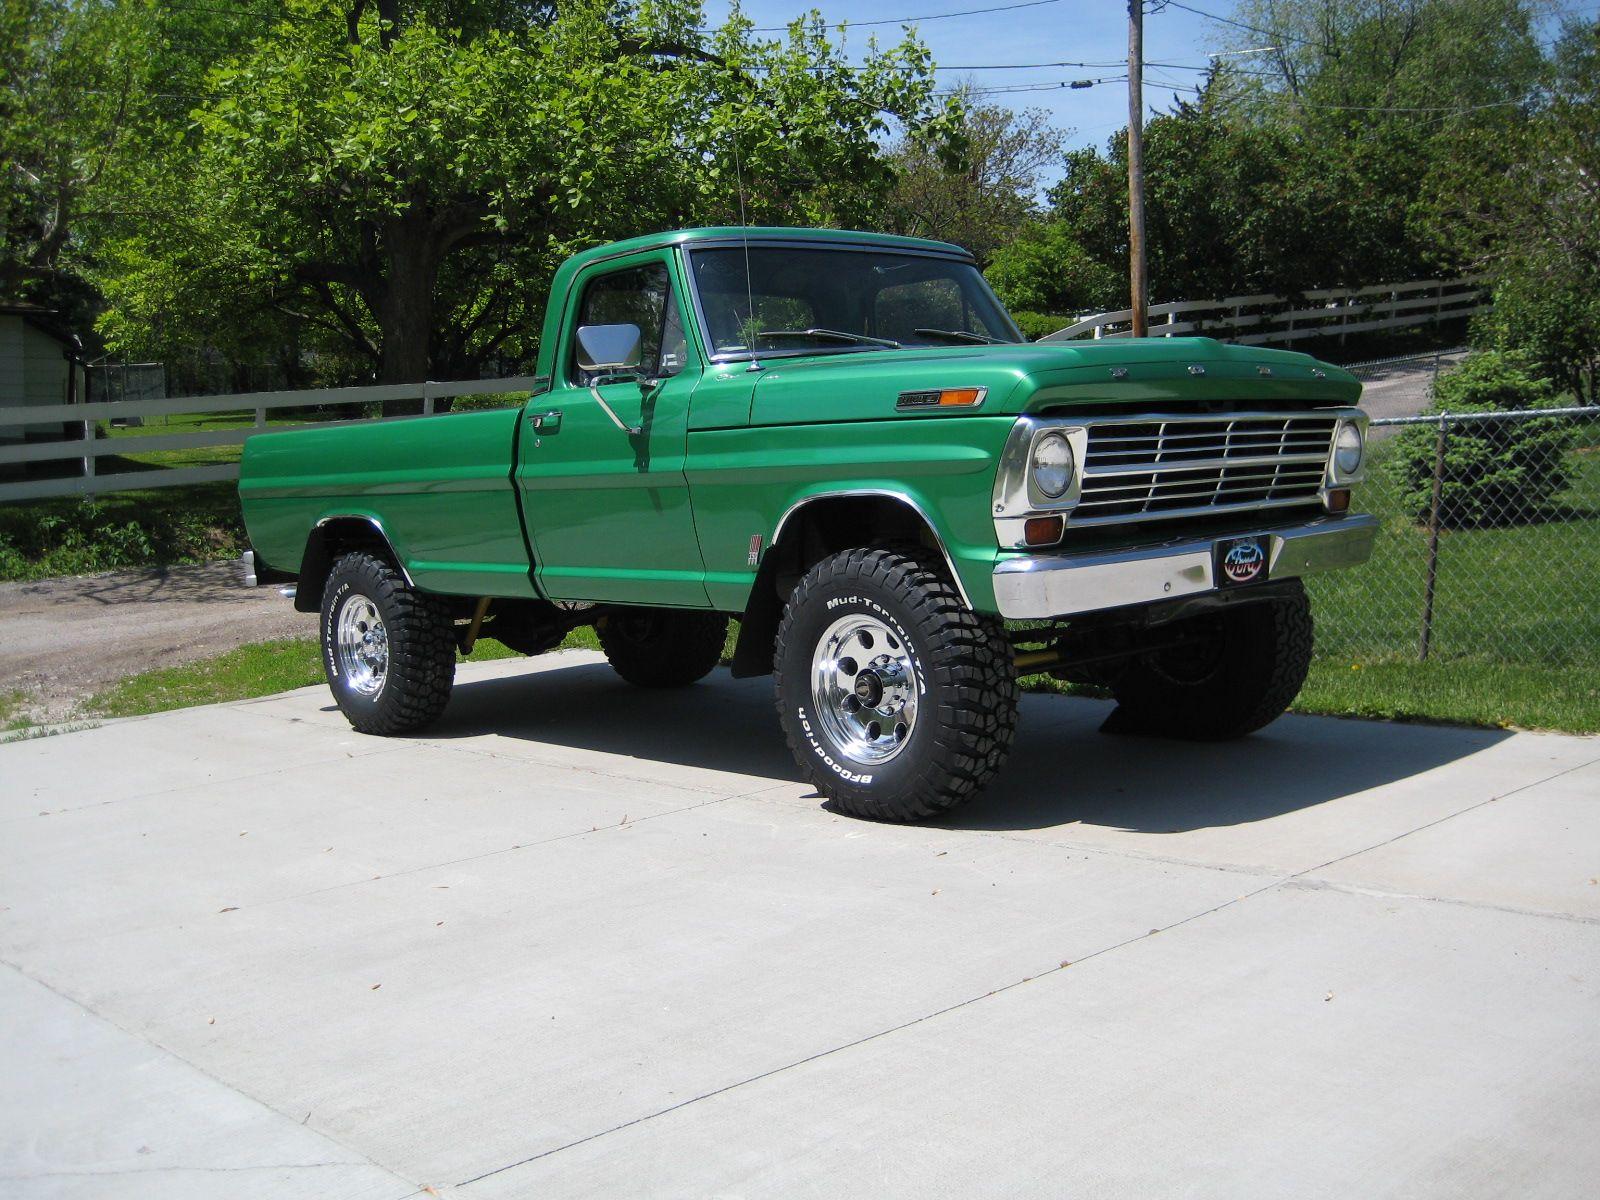 1967 ford f250....mmmhhhmmm | 67-79 ford f-100 | Pinterest ...  1967 ford f250....